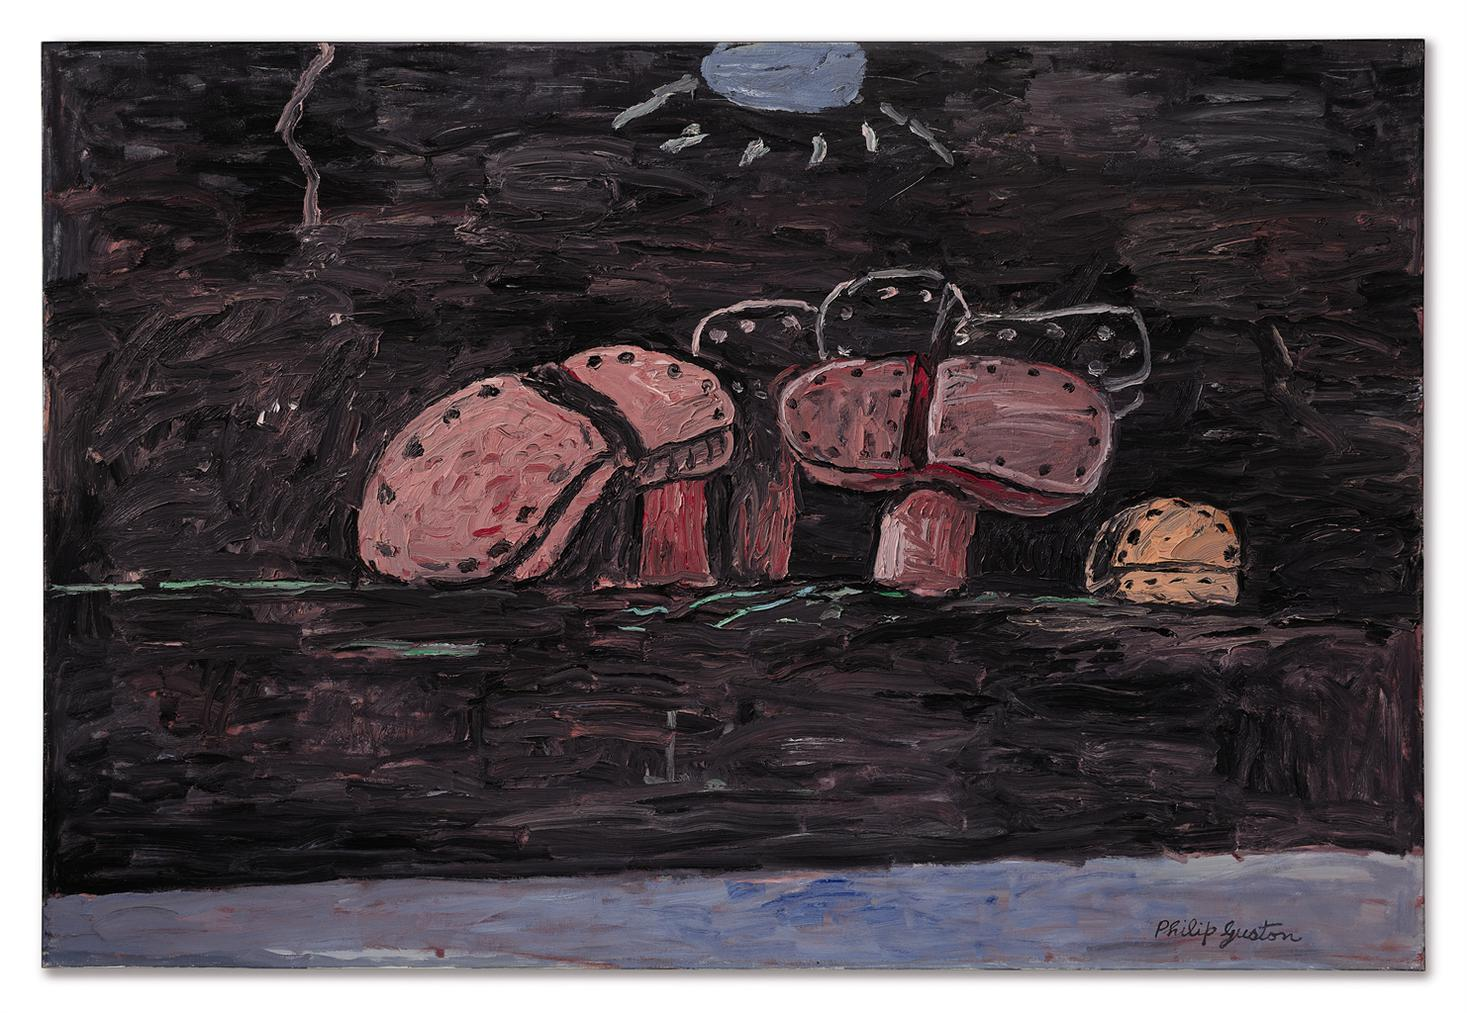 Philip Guston-Moonlight-1975